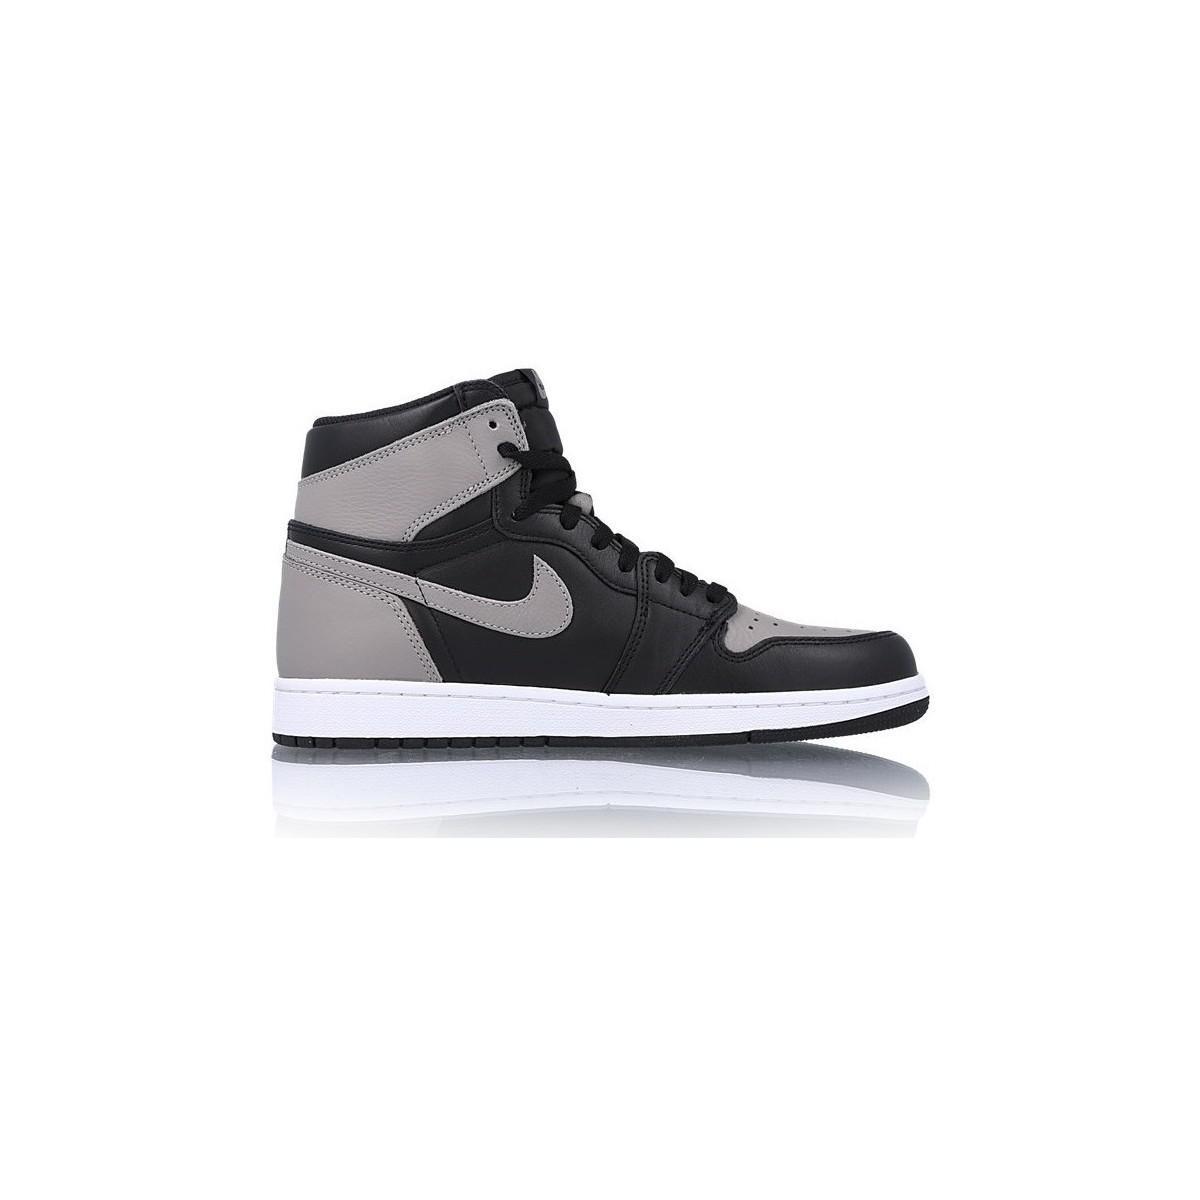 74a52f35adad38 Nike Air Jordan 1 Retro High Og Shadow Men s Shoes (high-top ...